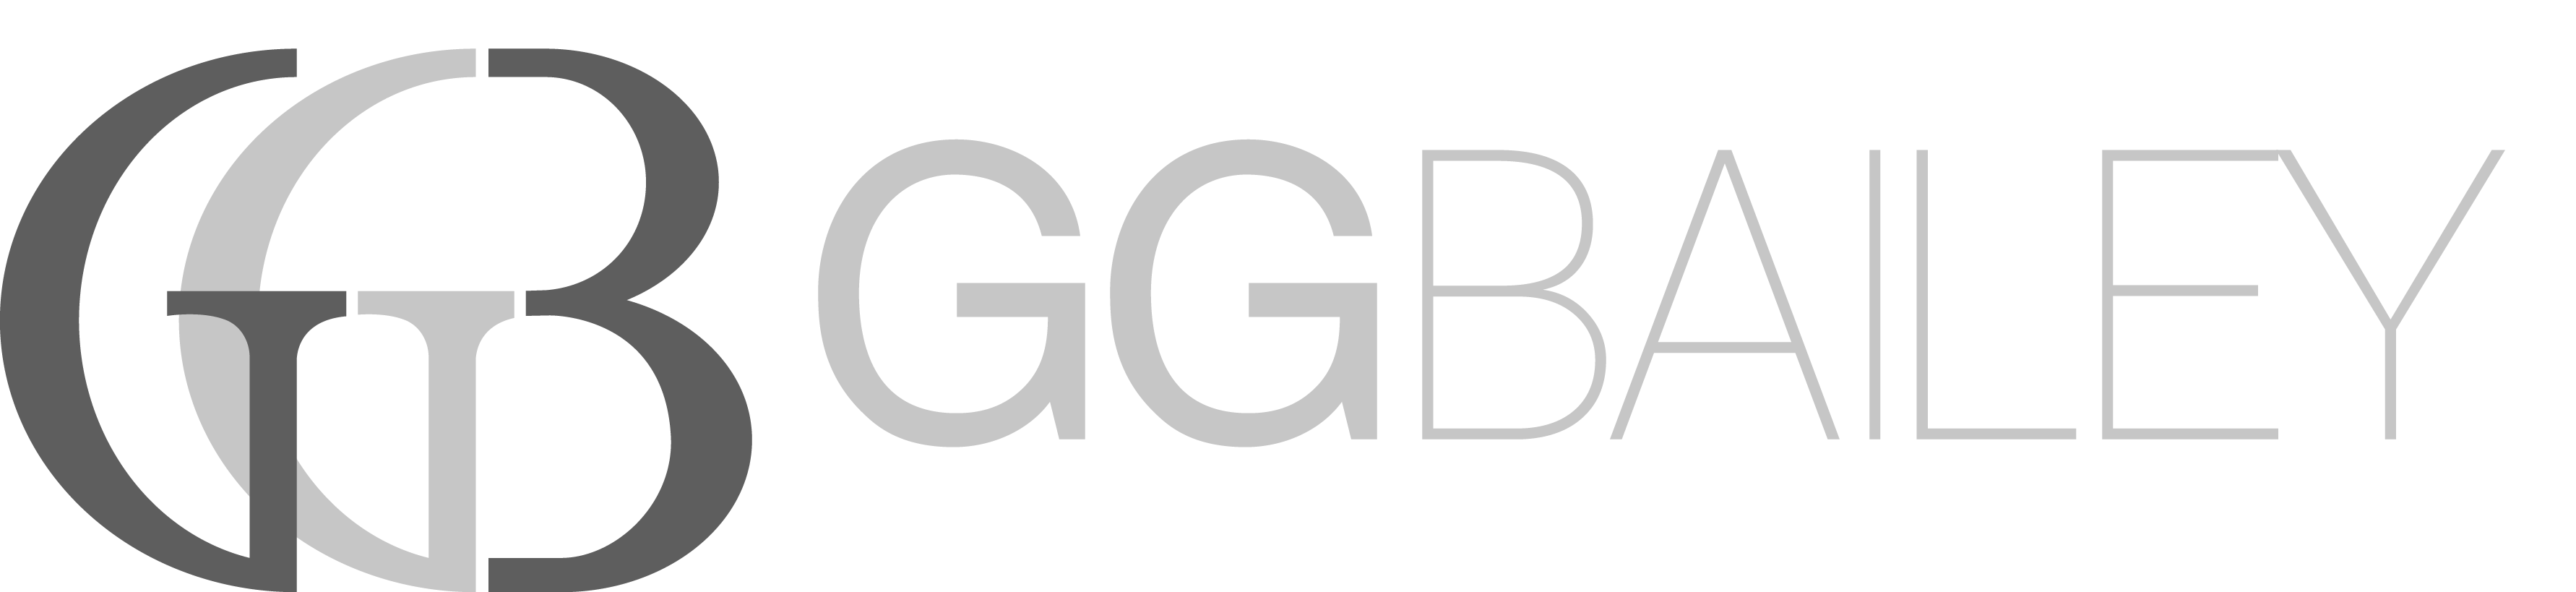 GGBAILEY_LOGO.png